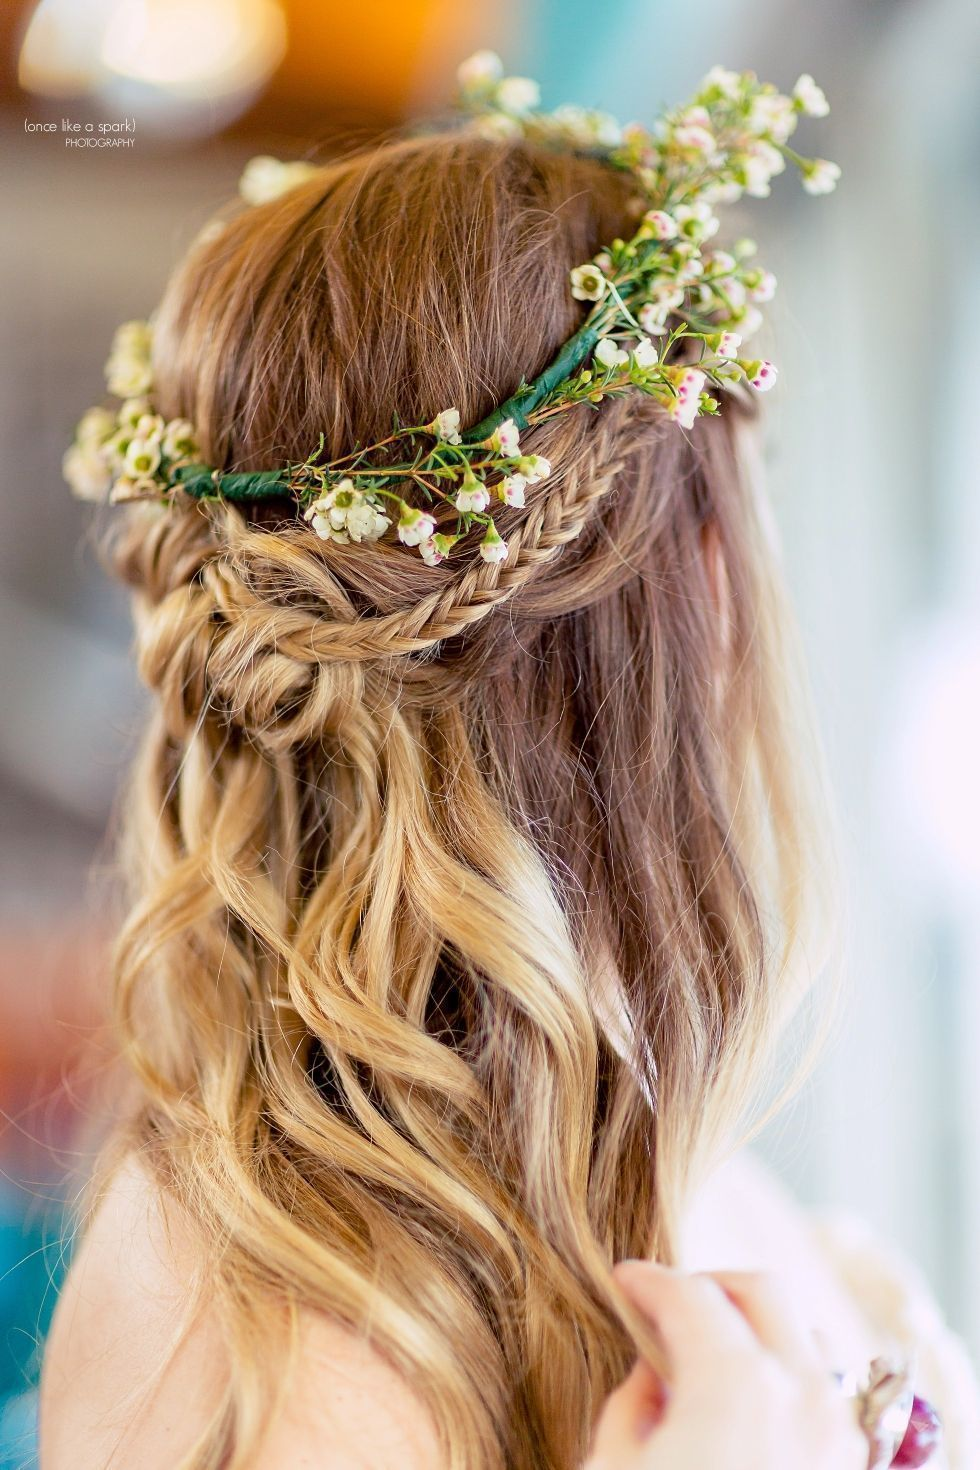 Bohemian inspired wedding hair simple flower crown for your wedding bohemian inspired wedding hair simple flower crown for your wedding day savannah izmirmasajfo